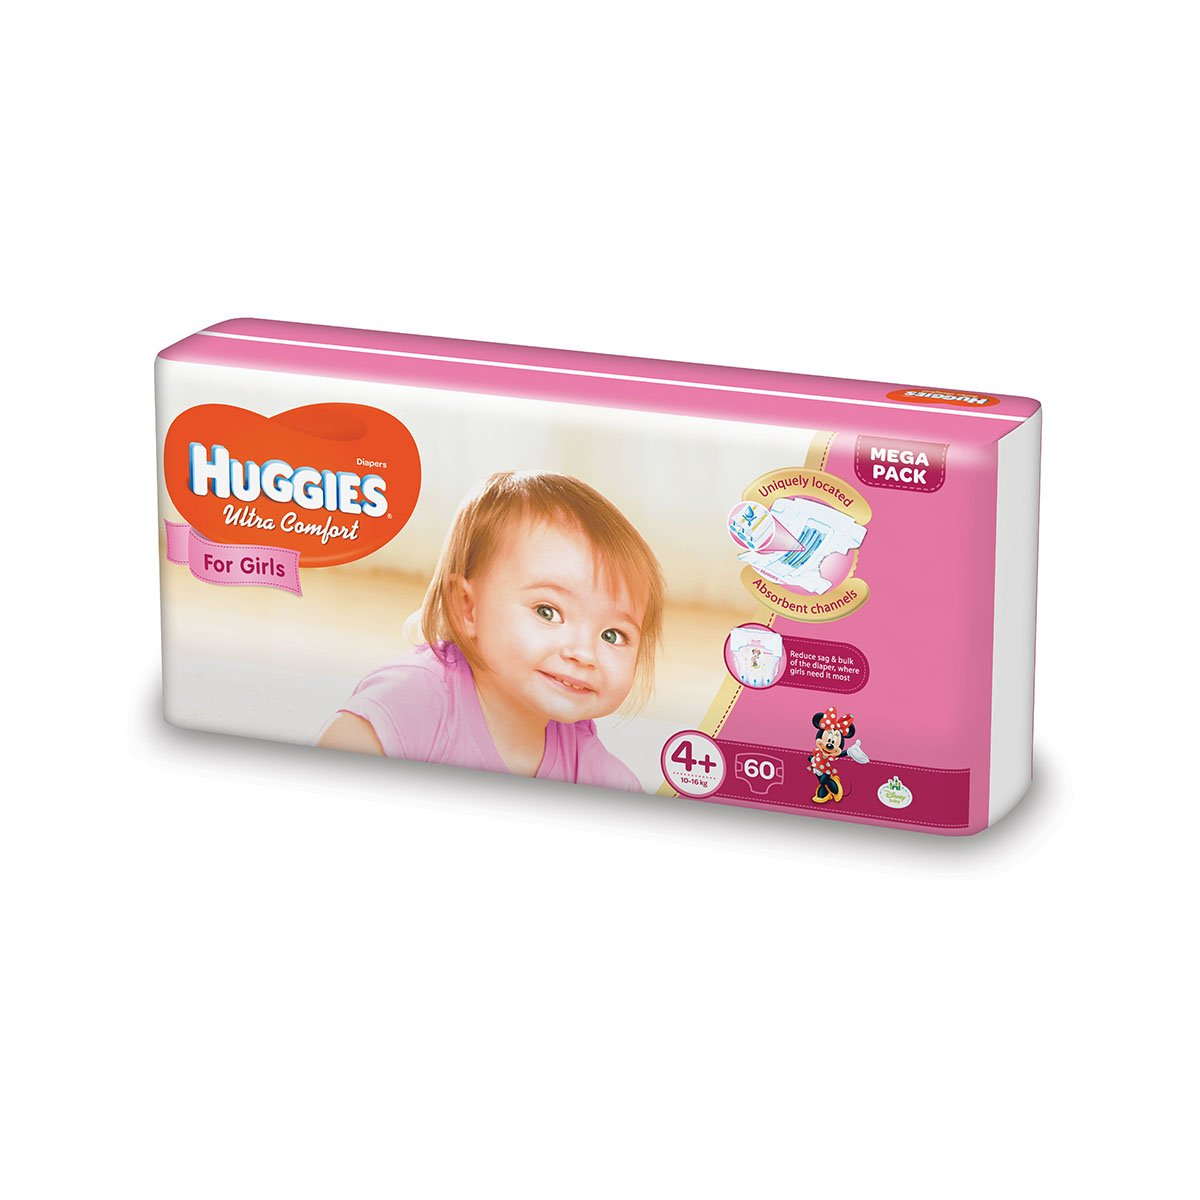 Scutece Huggies Mega Comfort Girls, Nr 4+, 10 - 16 Kg, 60 buc imagine